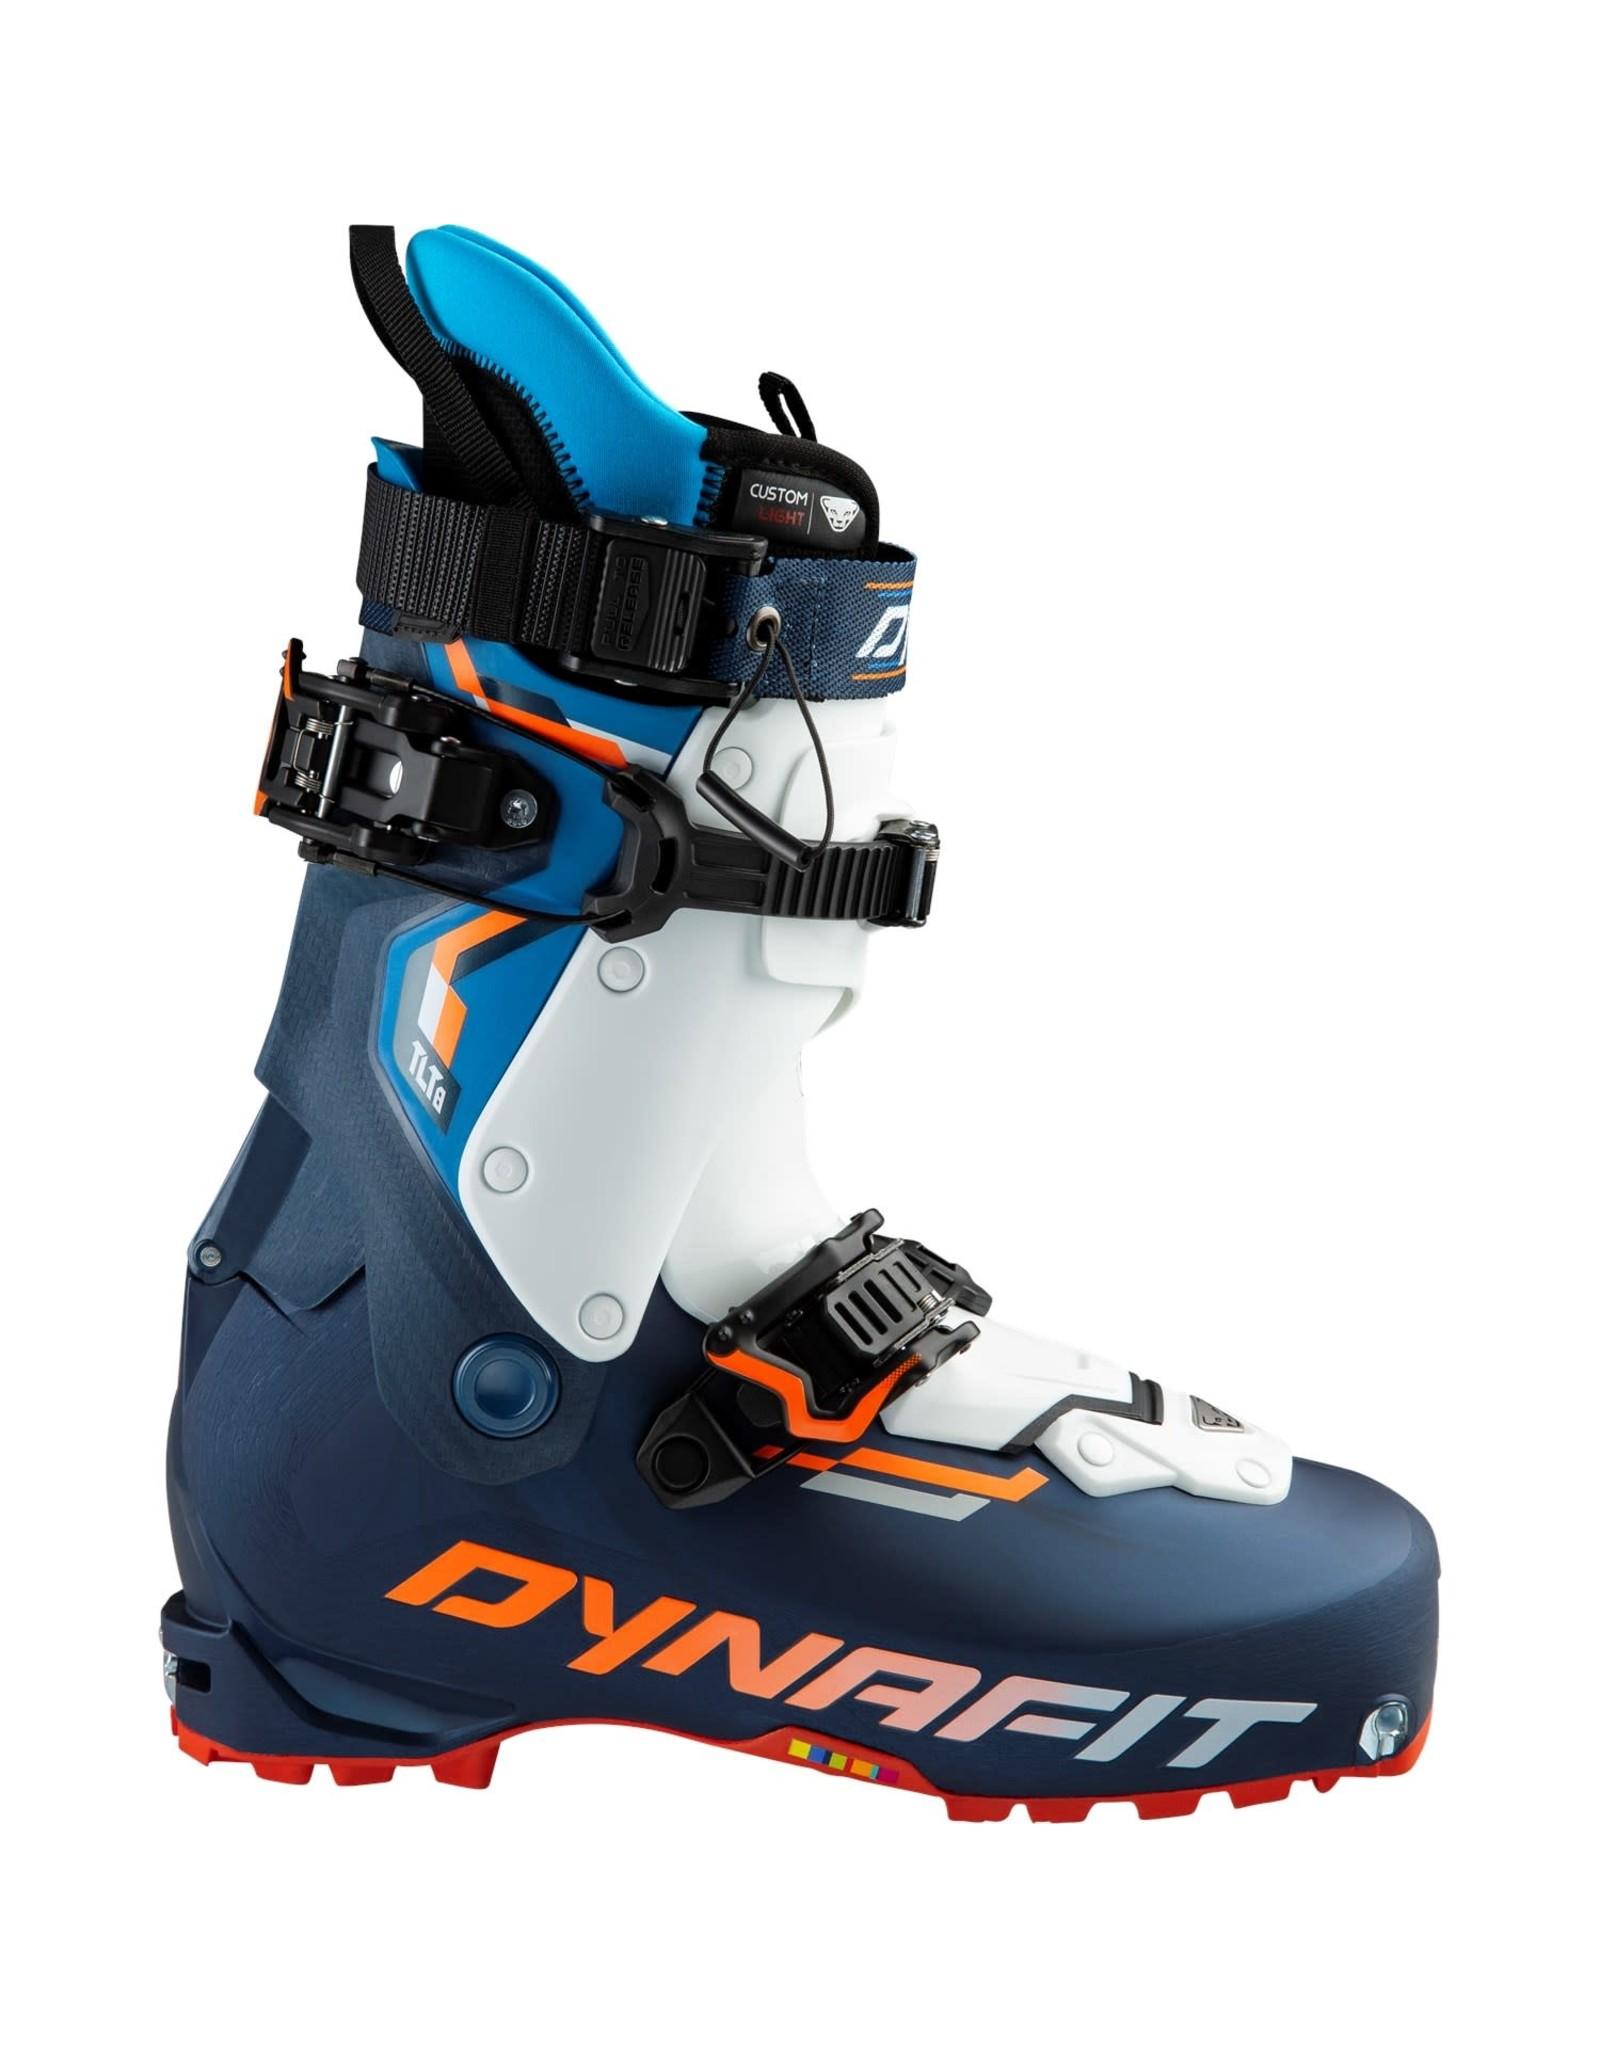 Dynafit Dynafit TLT8 Expedition Touring Boot - Men